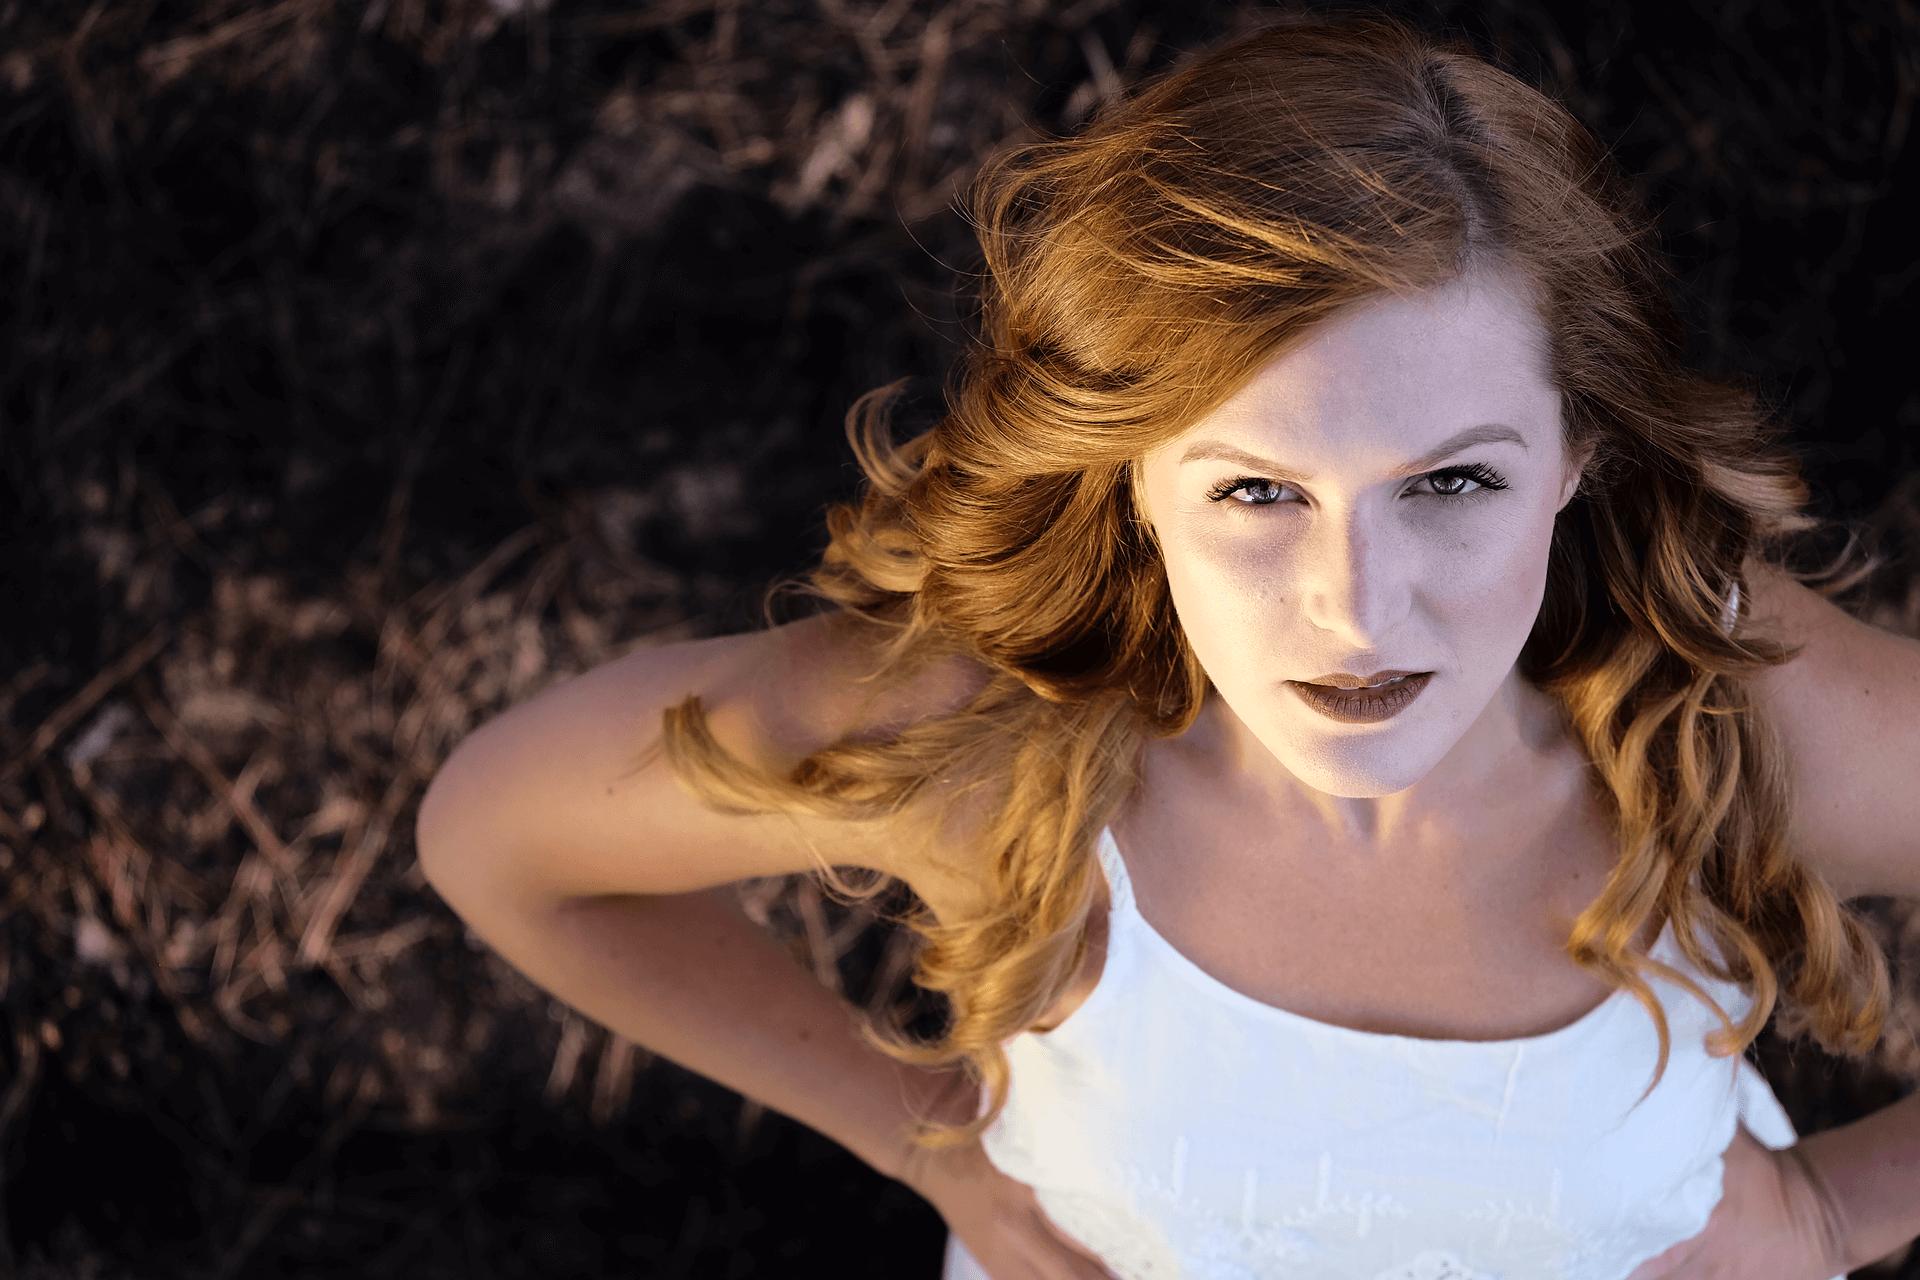 Luchtverontreiniging en huidschade